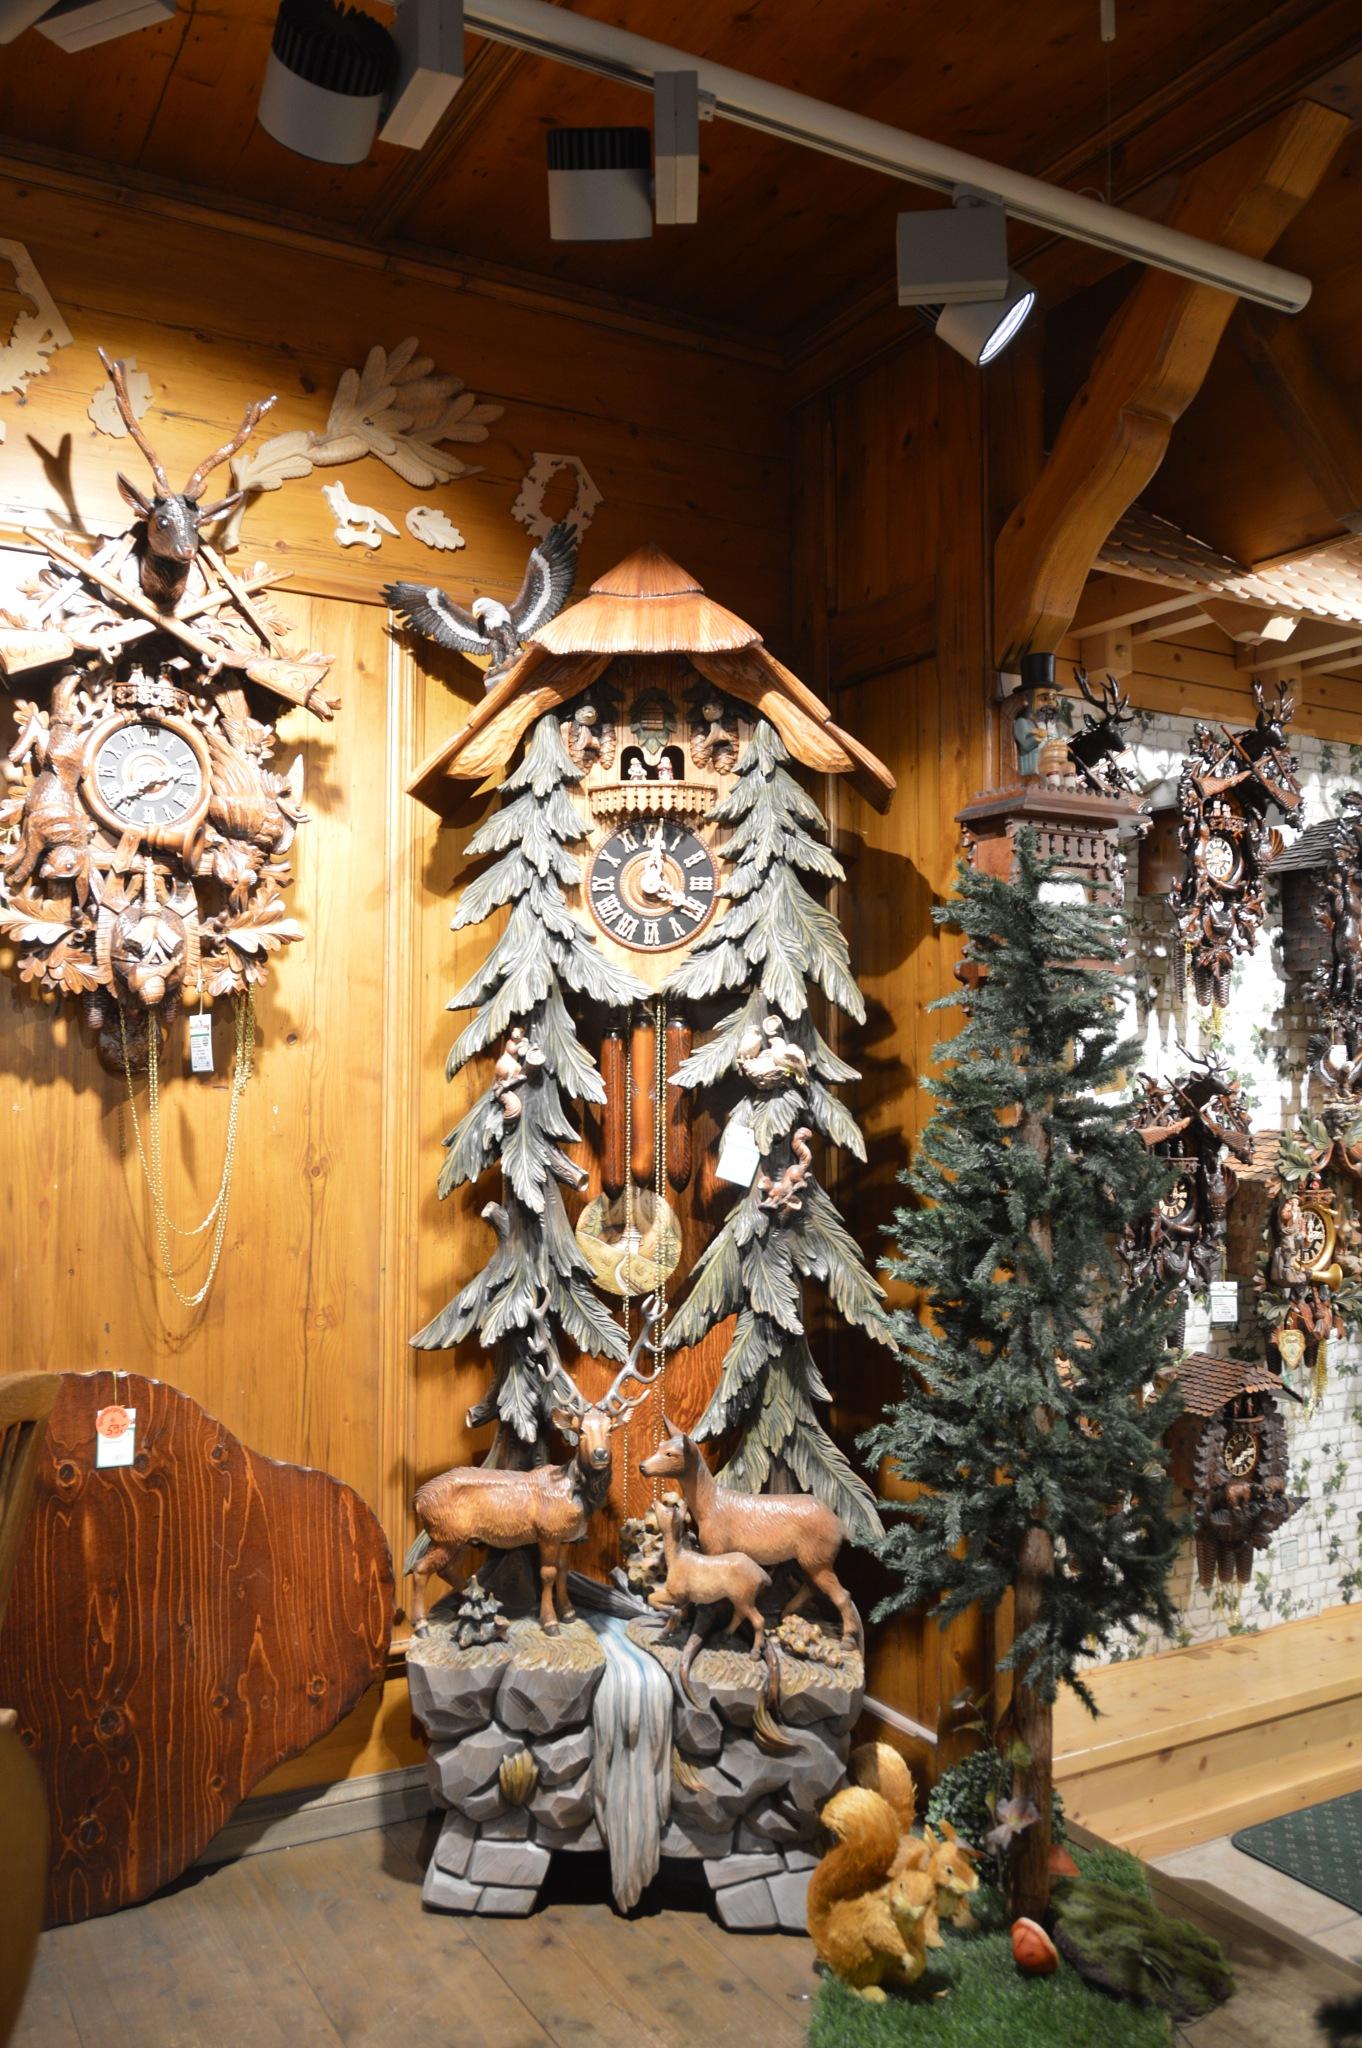 Cuckoo Clocks by Nik On Landscapes